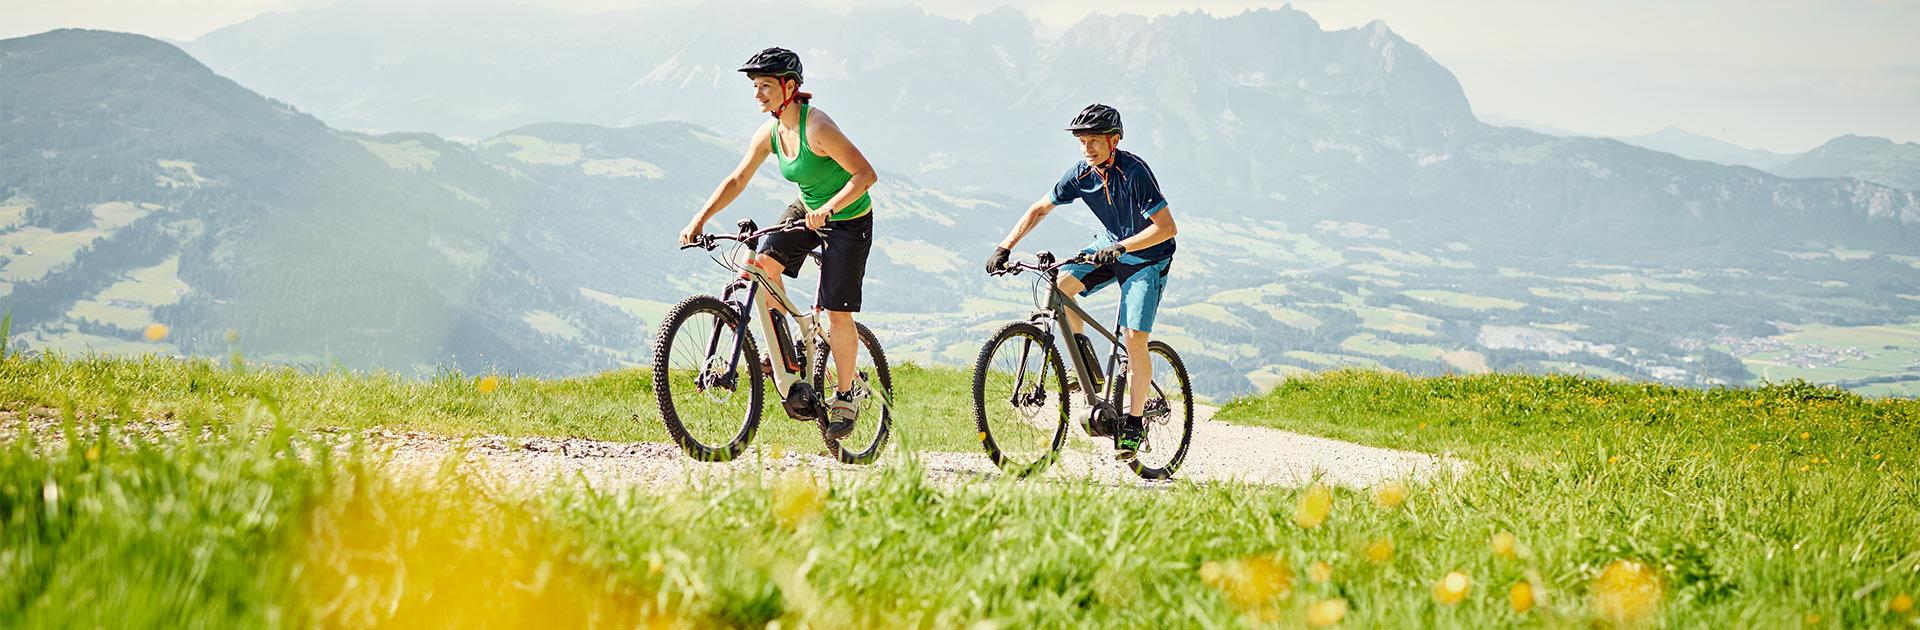 kreidler vitality eco 2 7 g nexus rt bosch elektro fahrrad neu. Black Bedroom Furniture Sets. Home Design Ideas